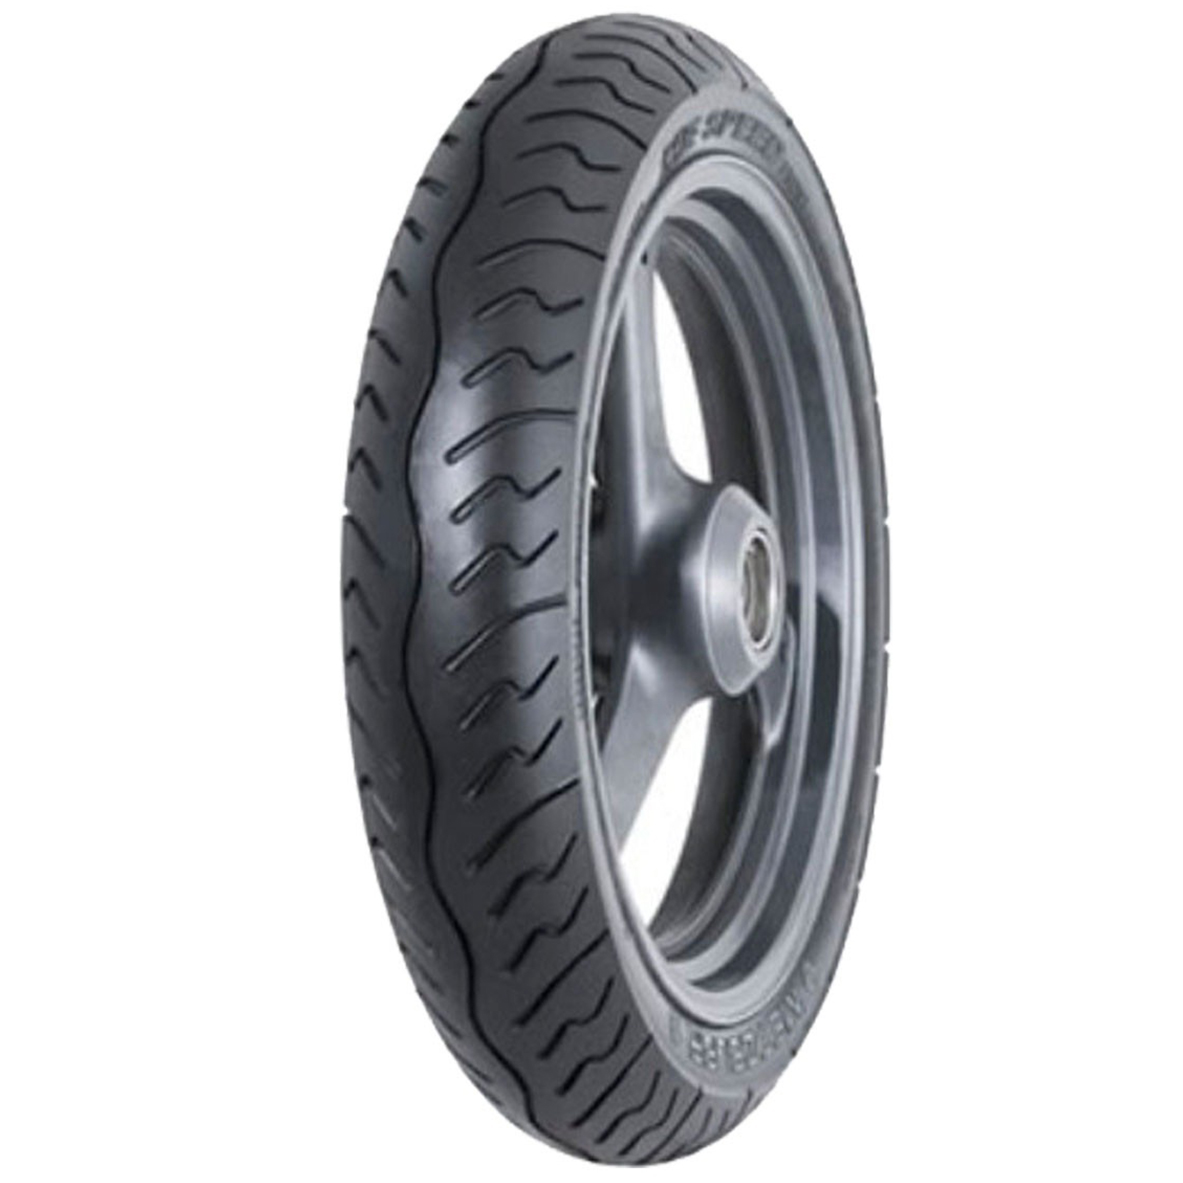 Metzeler ME SPEED 300 18 Tubeless 52 P Rear Two-Wheeler Tyre